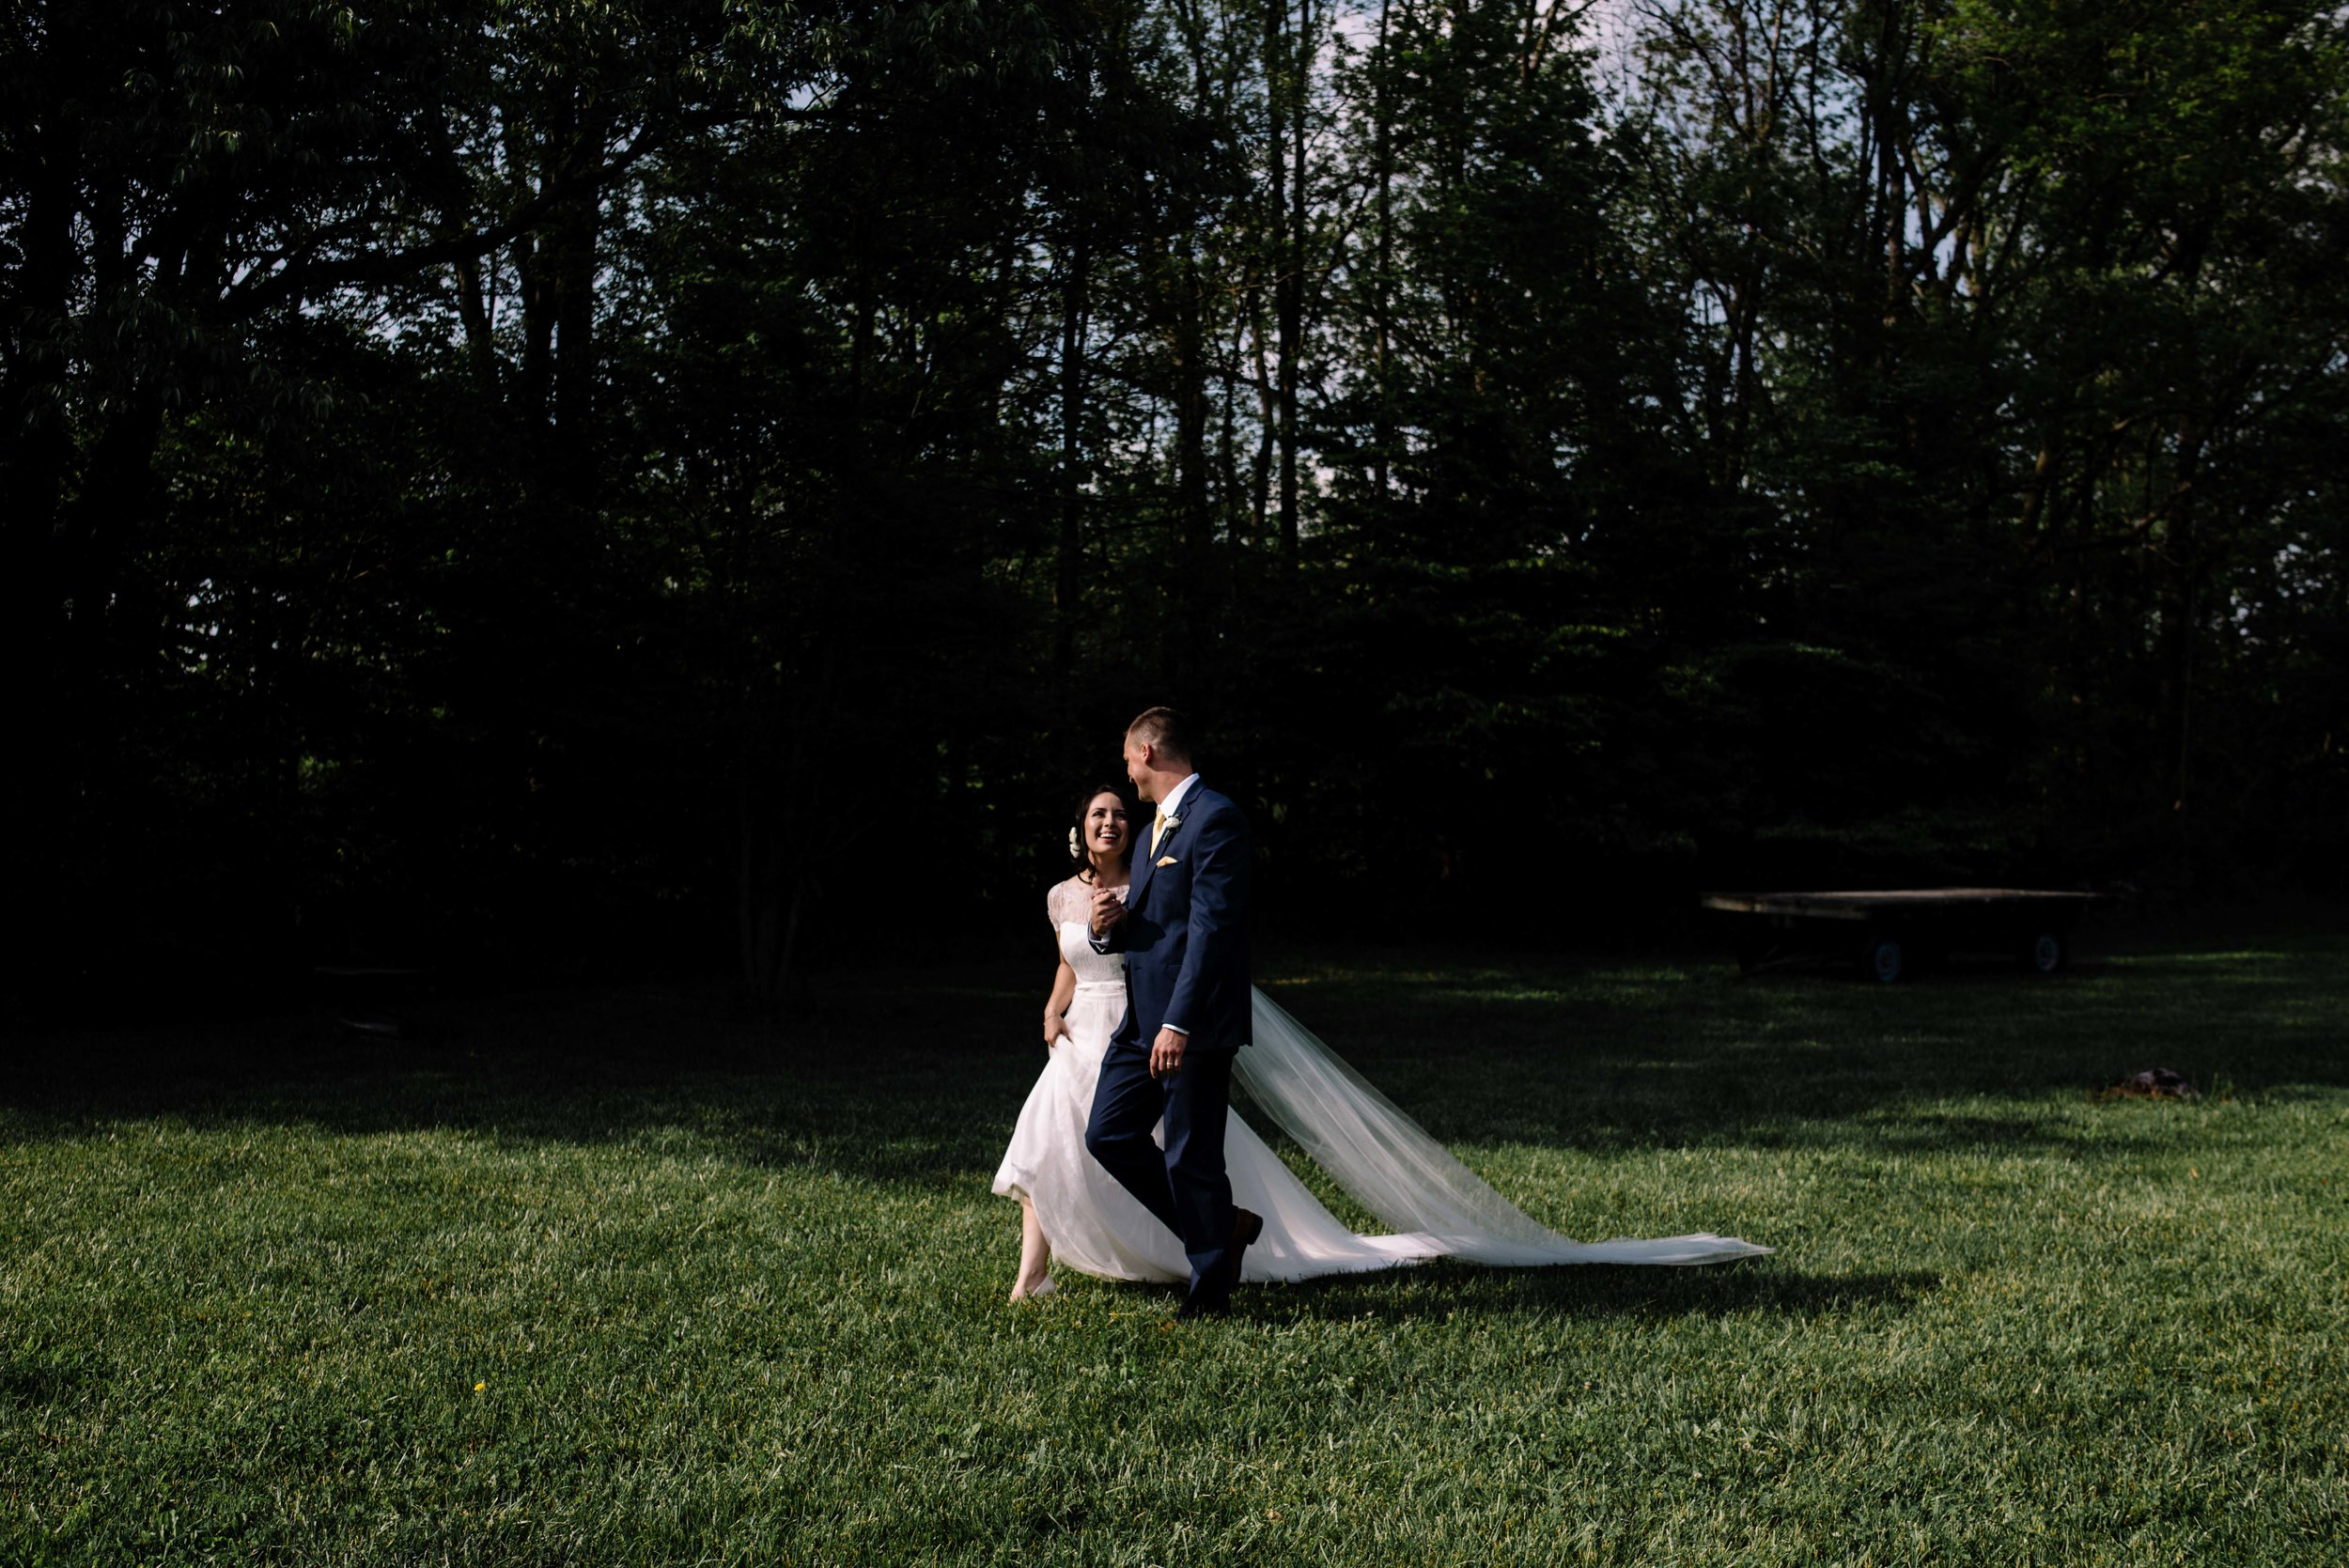 Ana-Dan-Blog-Indianapolis-Wedding-50.jpg